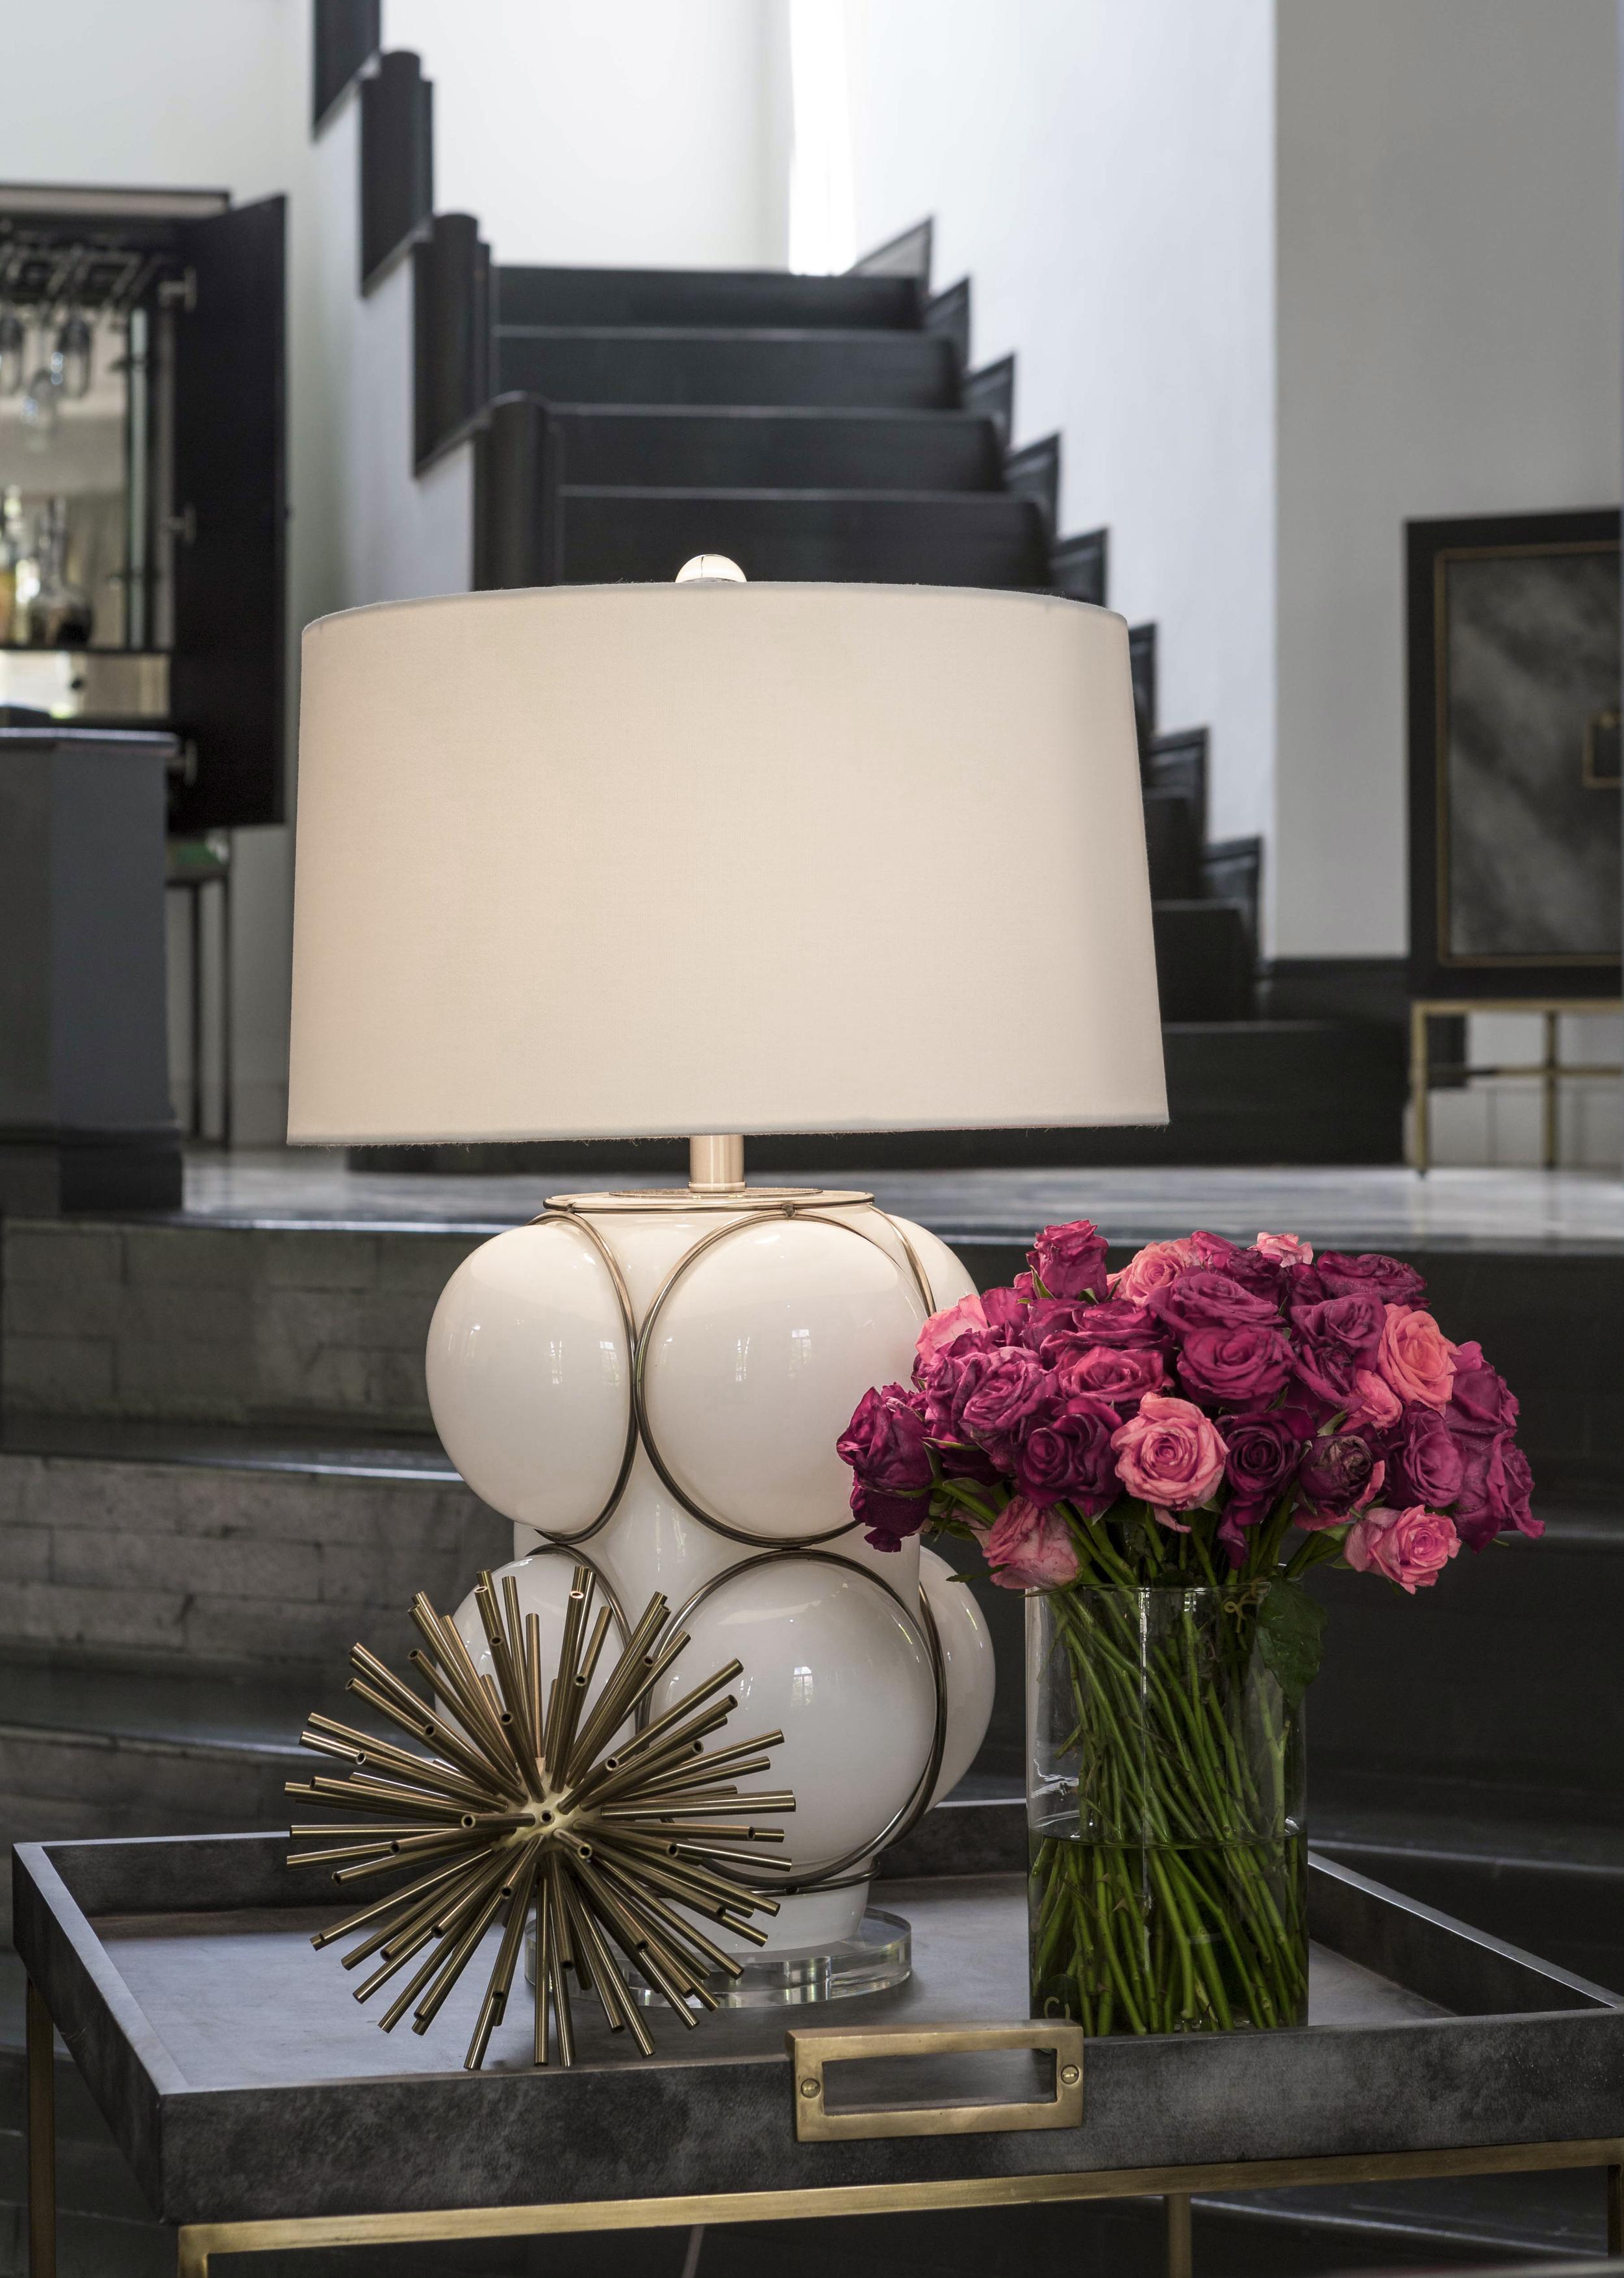 Nellcote_Studio_White_Bubble lamp.jpg